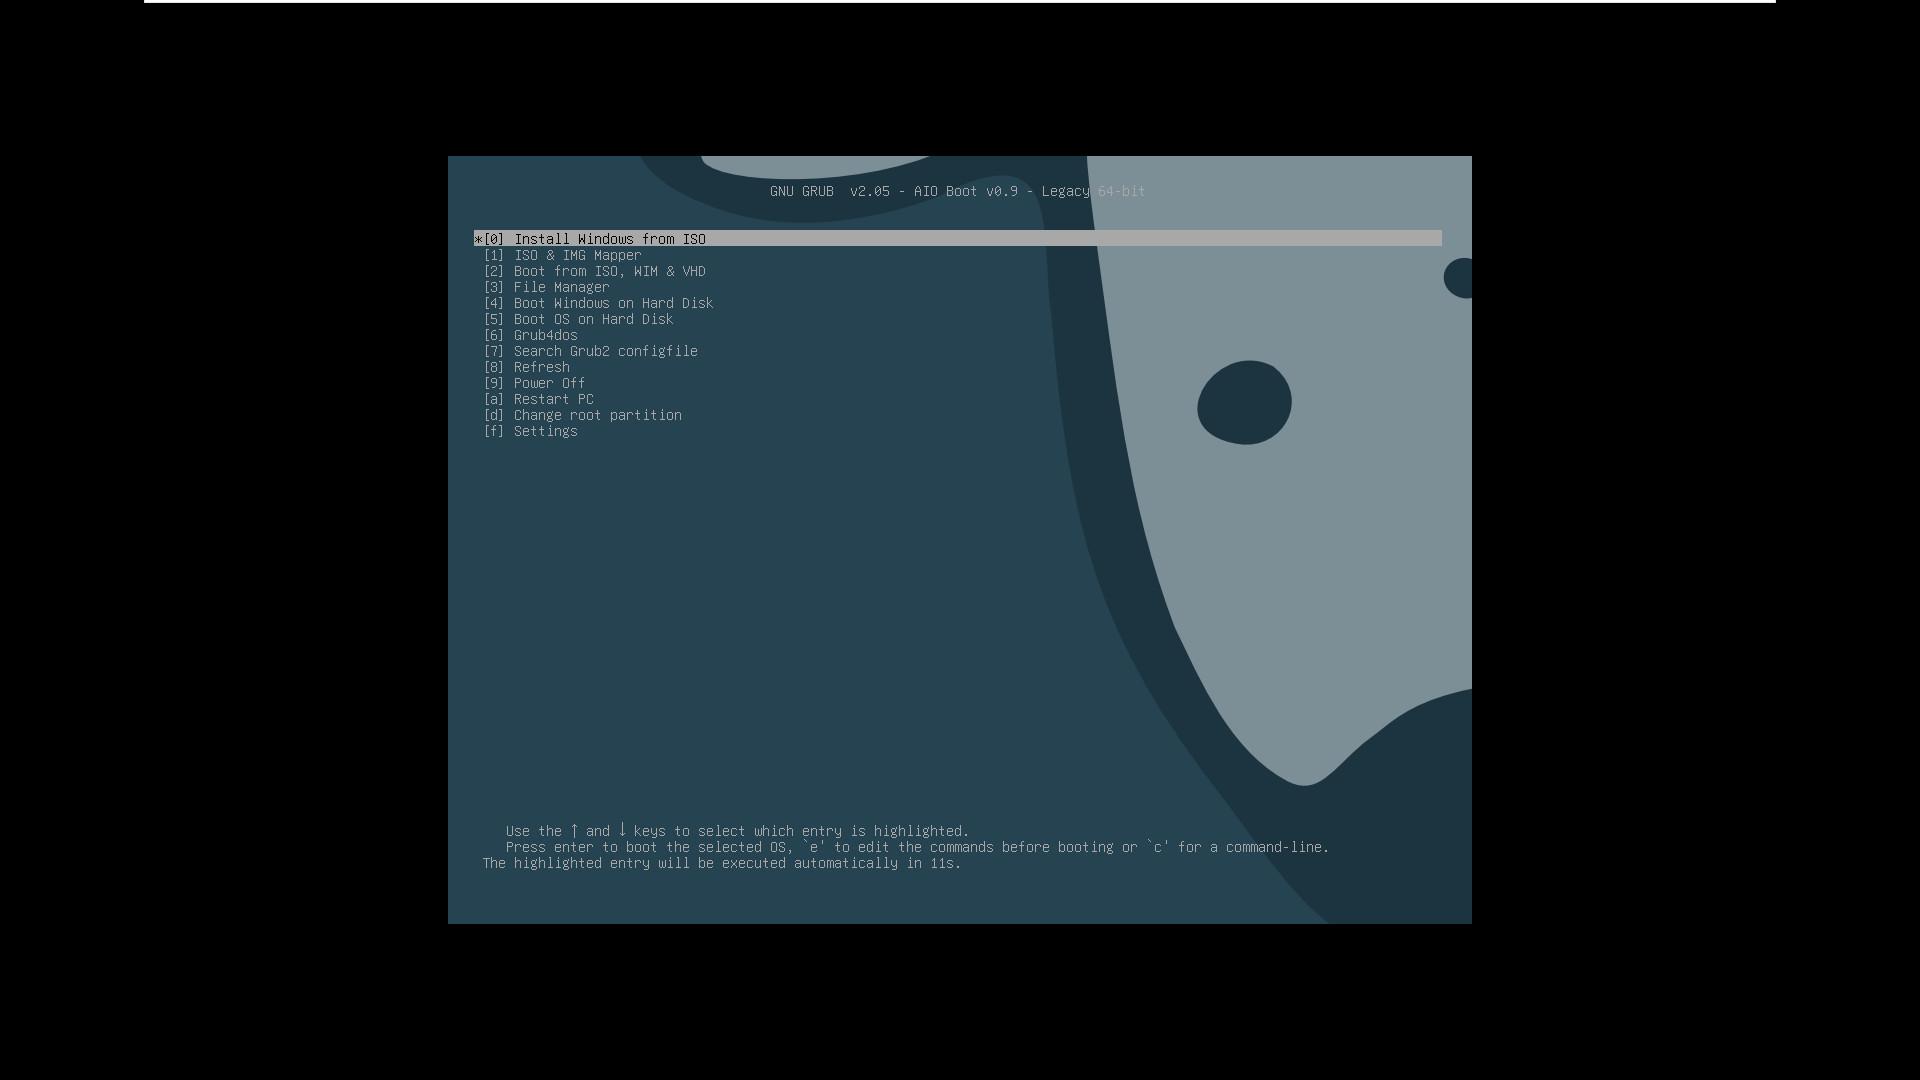 Ventoy 제가 올린 외부 설정 파일 - AIO Boot로 전환 잘 됩니다. BIOS 모드 2020-09-26_180330.jpg